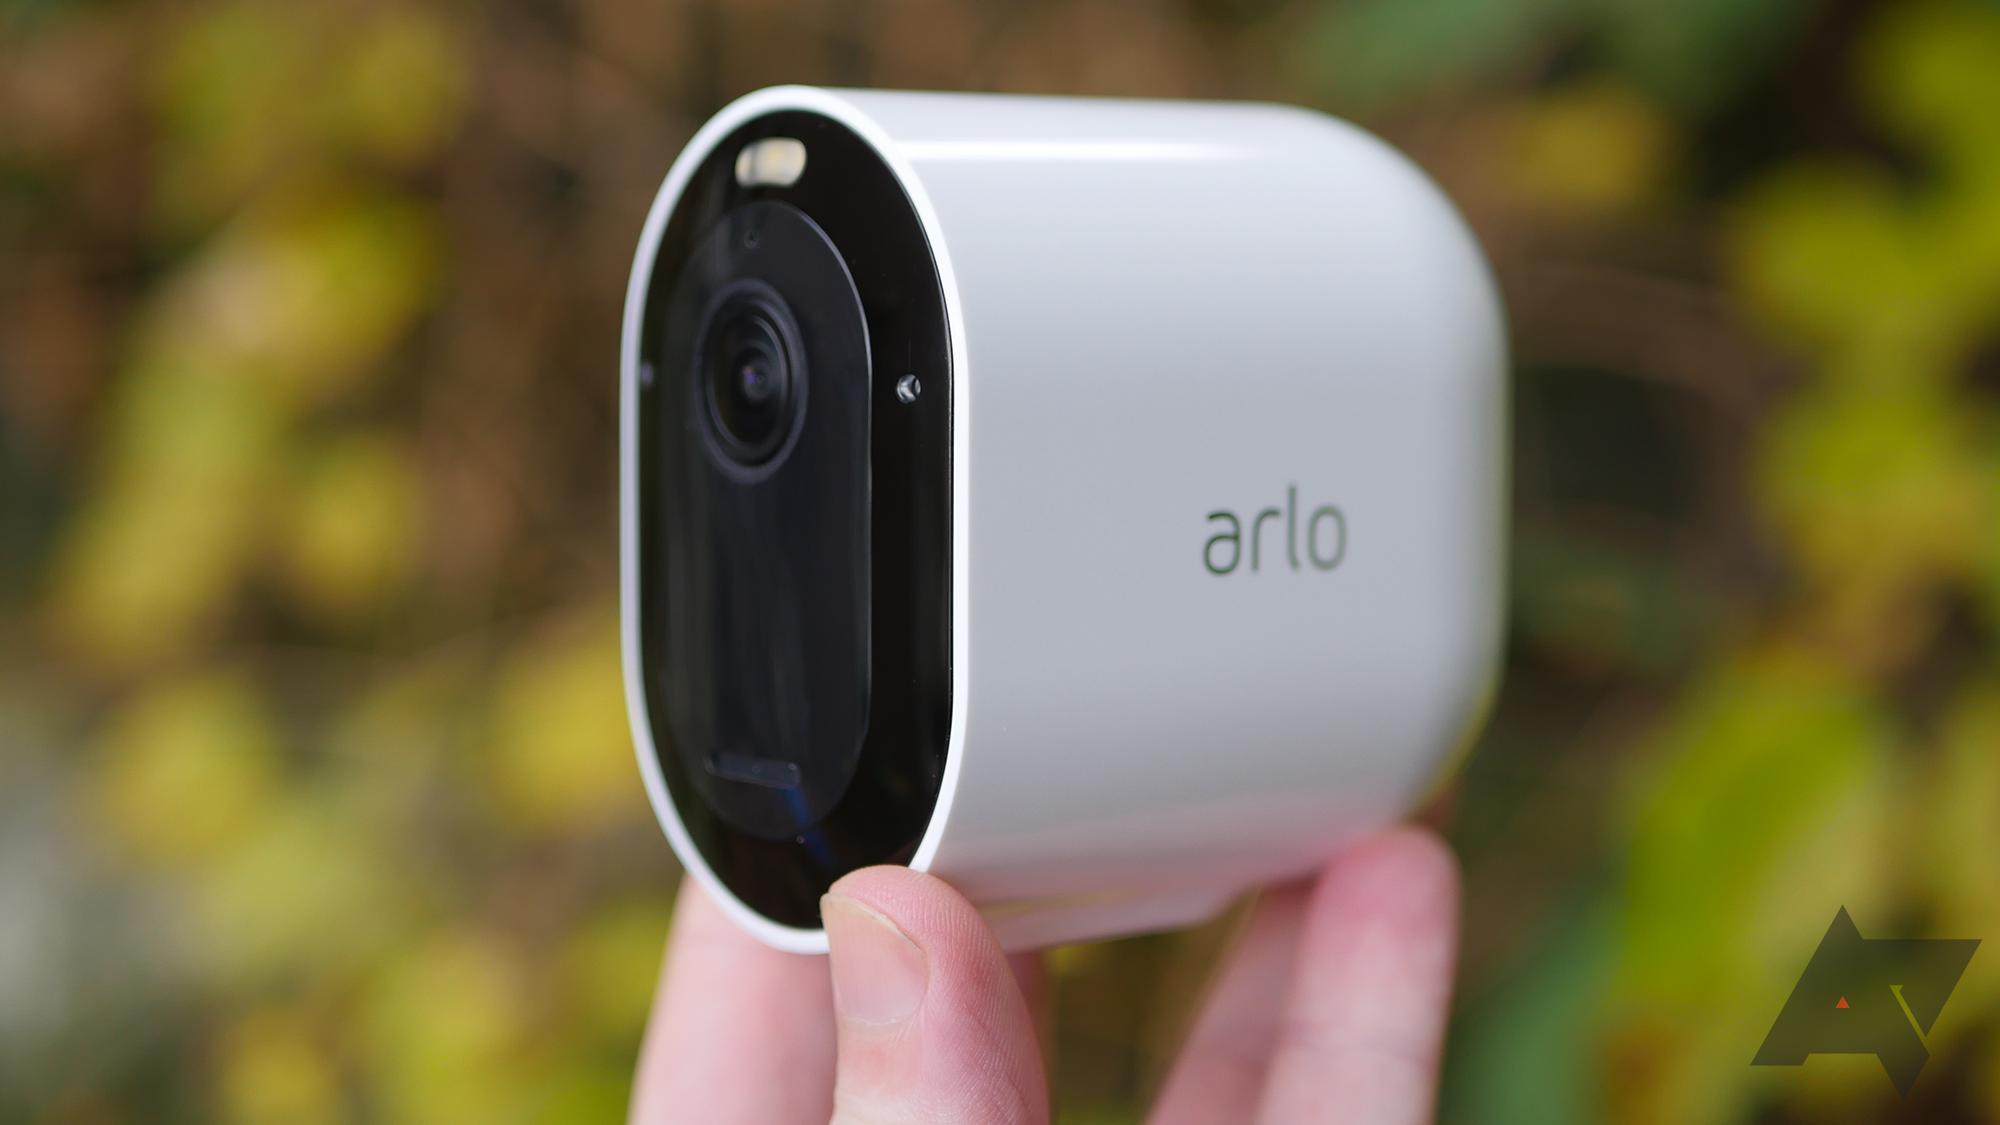 arlo pro 3 camera system